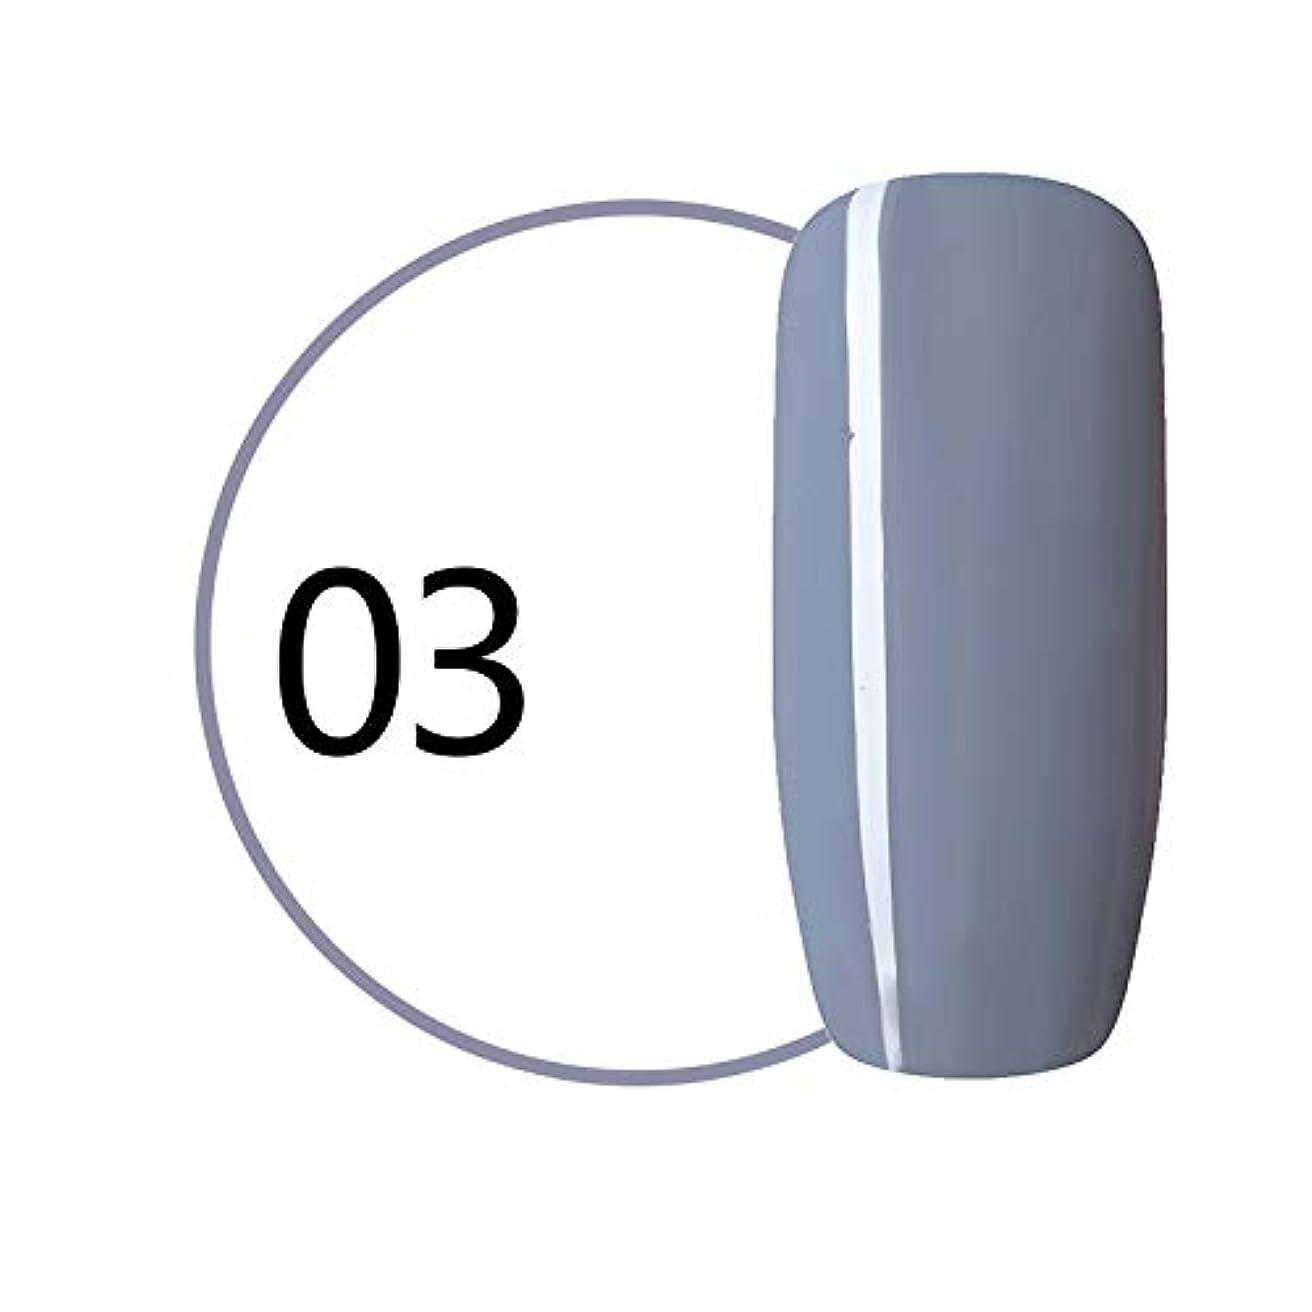 Symboat マニキュア ソークオフ UV LED ネイルジェルポリッシュ ワイングレーシリーズ ネイル用品 女優 人気 初心者にも対応 安全 無毒